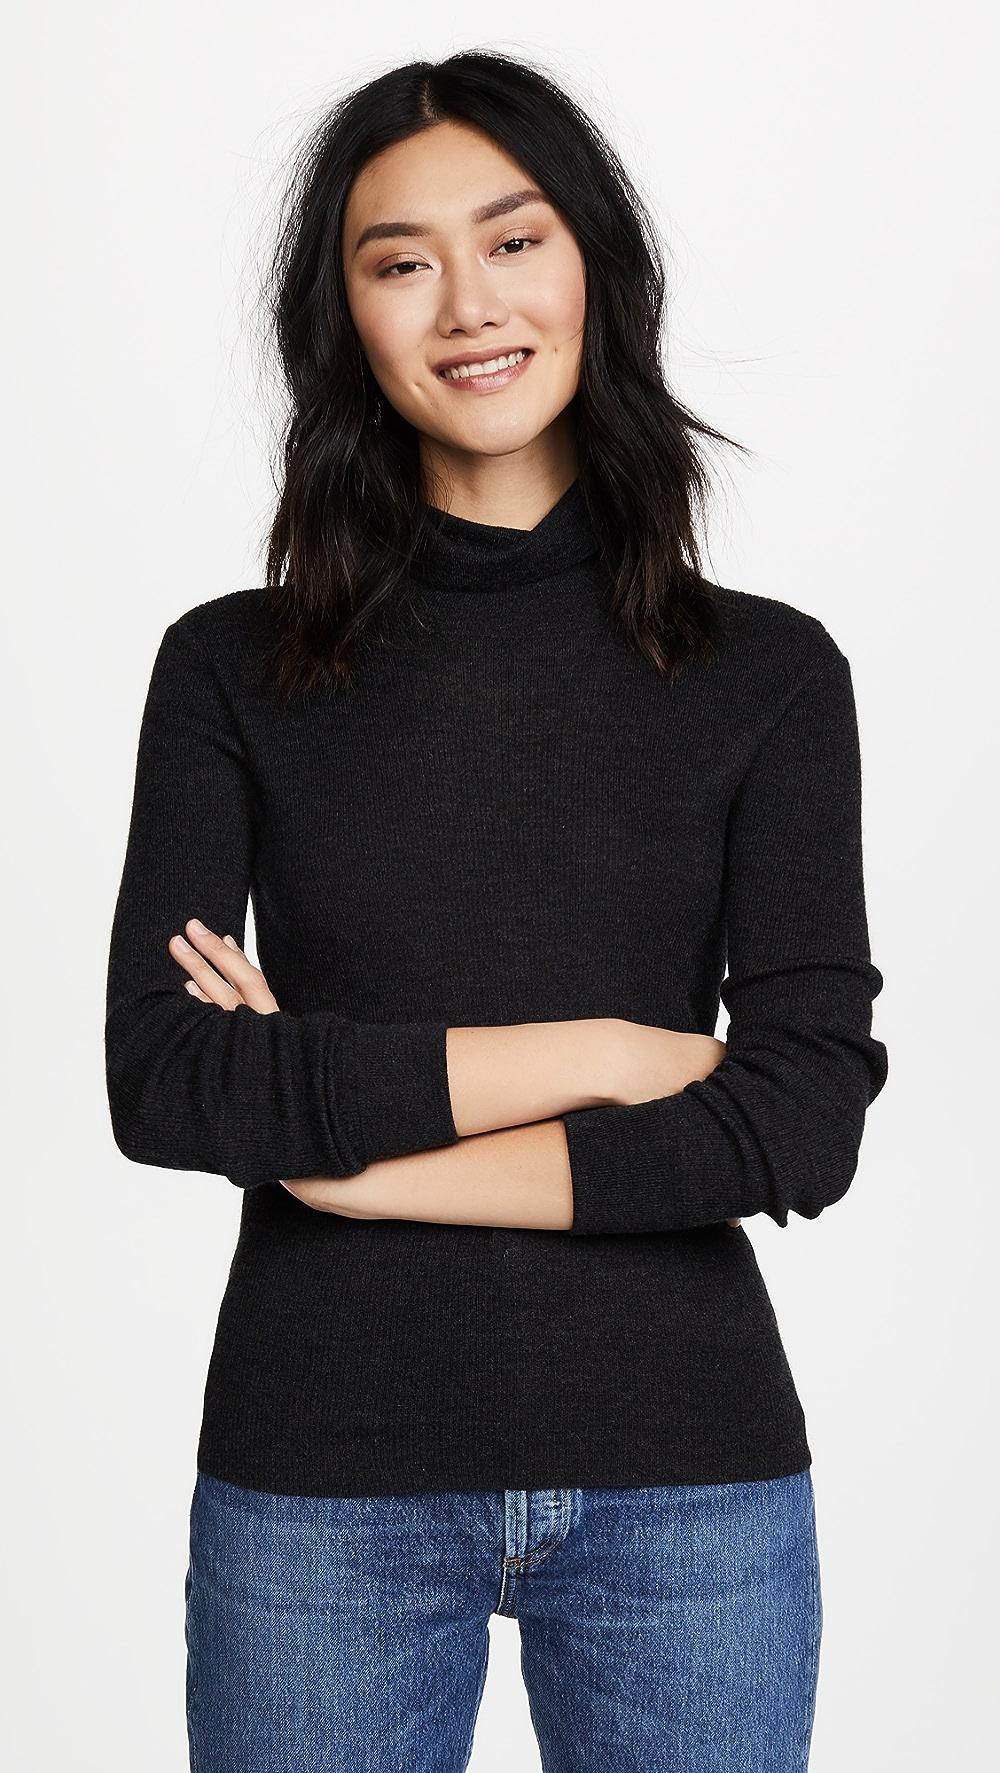 2019 Latest Design Tse Cashmere - Turtleneck Sweater Regular Tea Drinking Improves Your Health